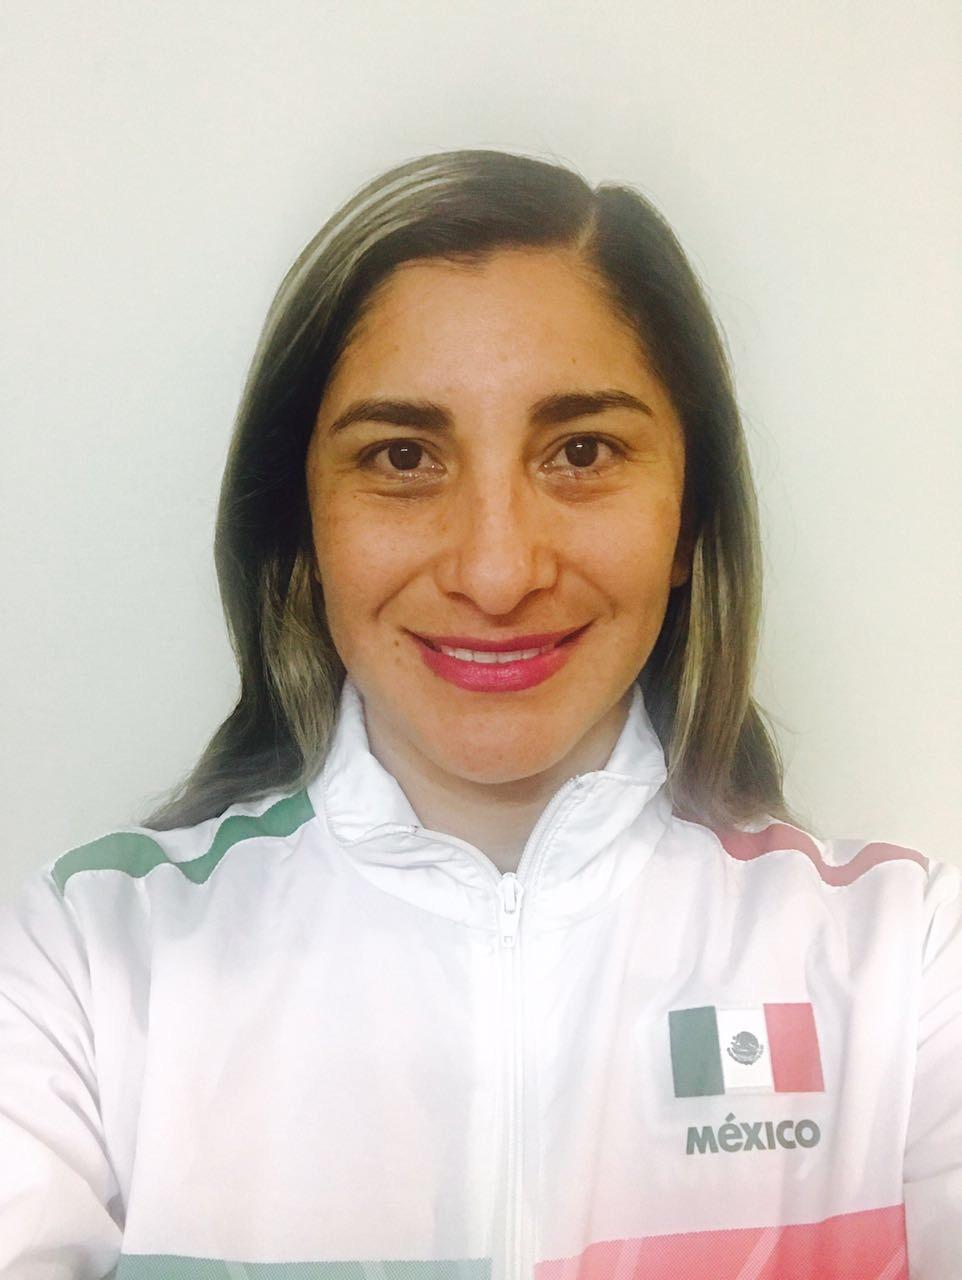 Gabriela Isela Alarcón Gómez